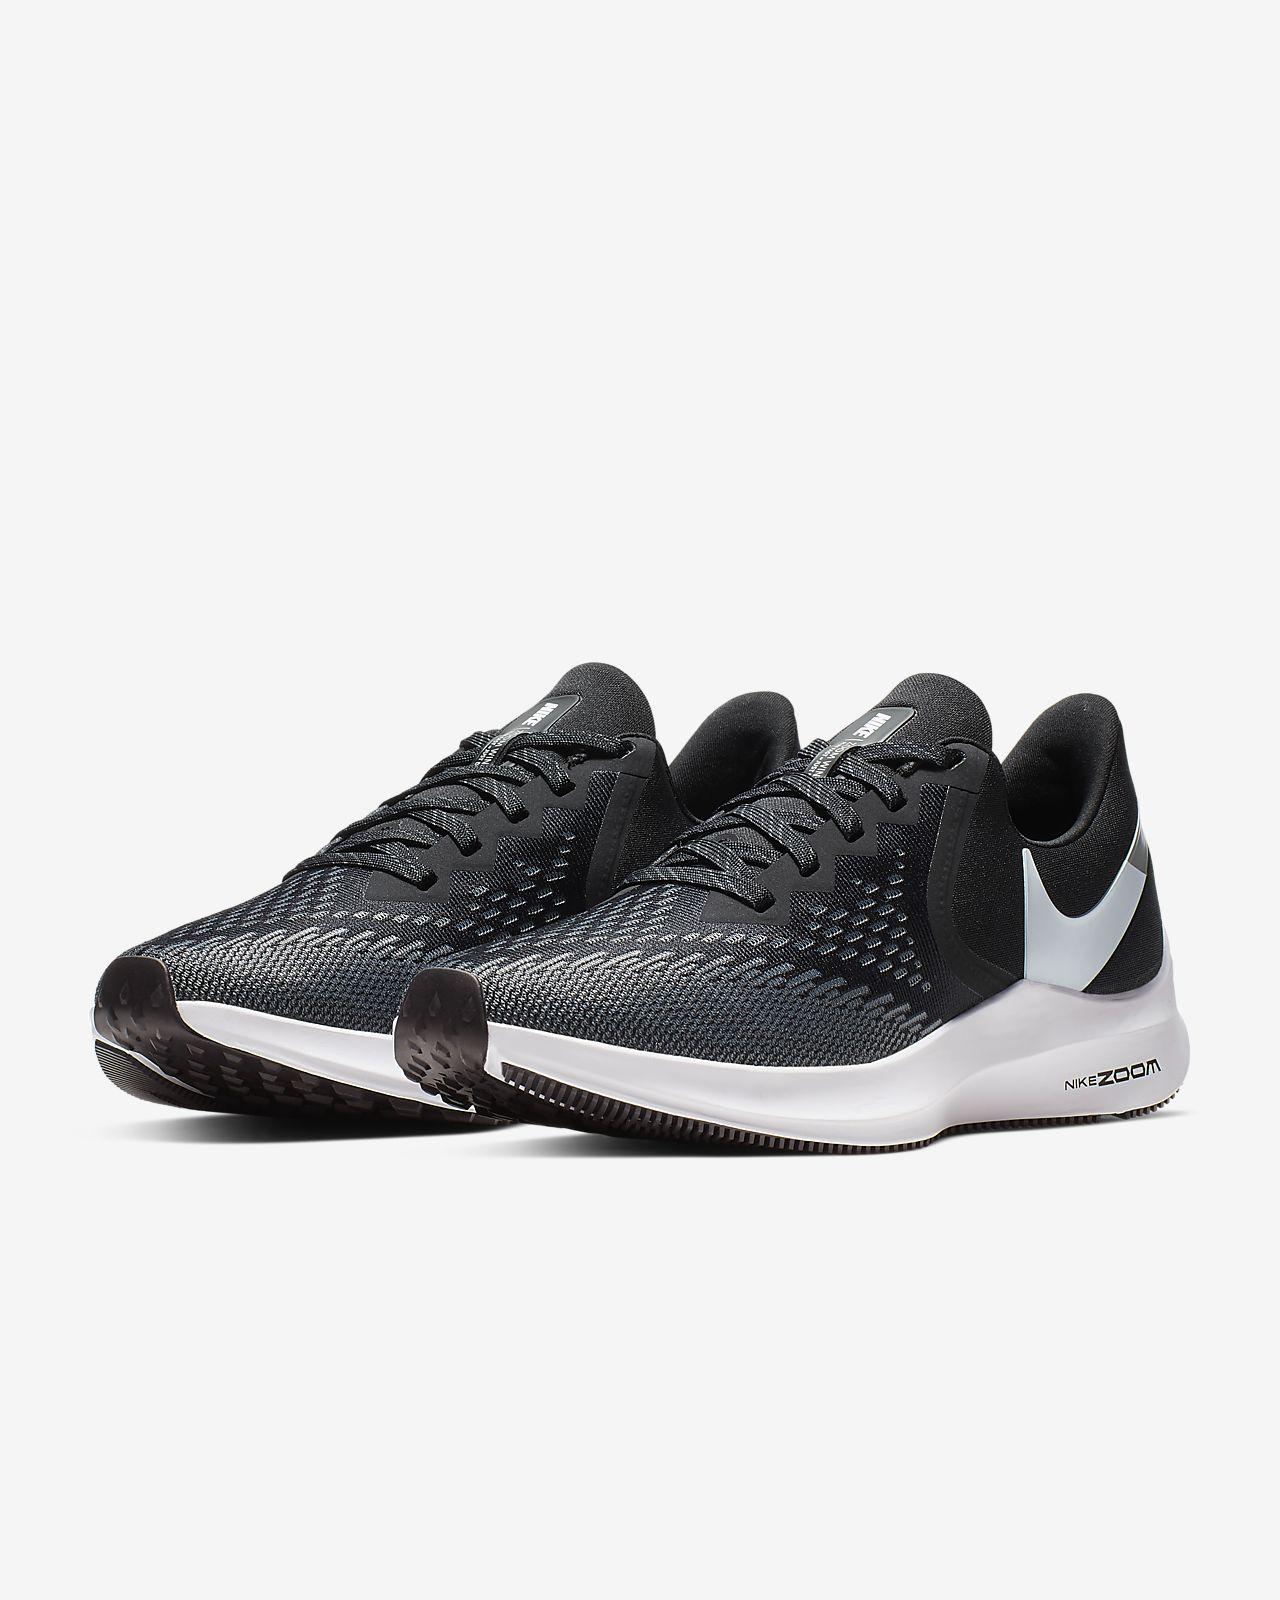 Sapatilhas de running Nike Air Zoom Winflo 6 para mulher